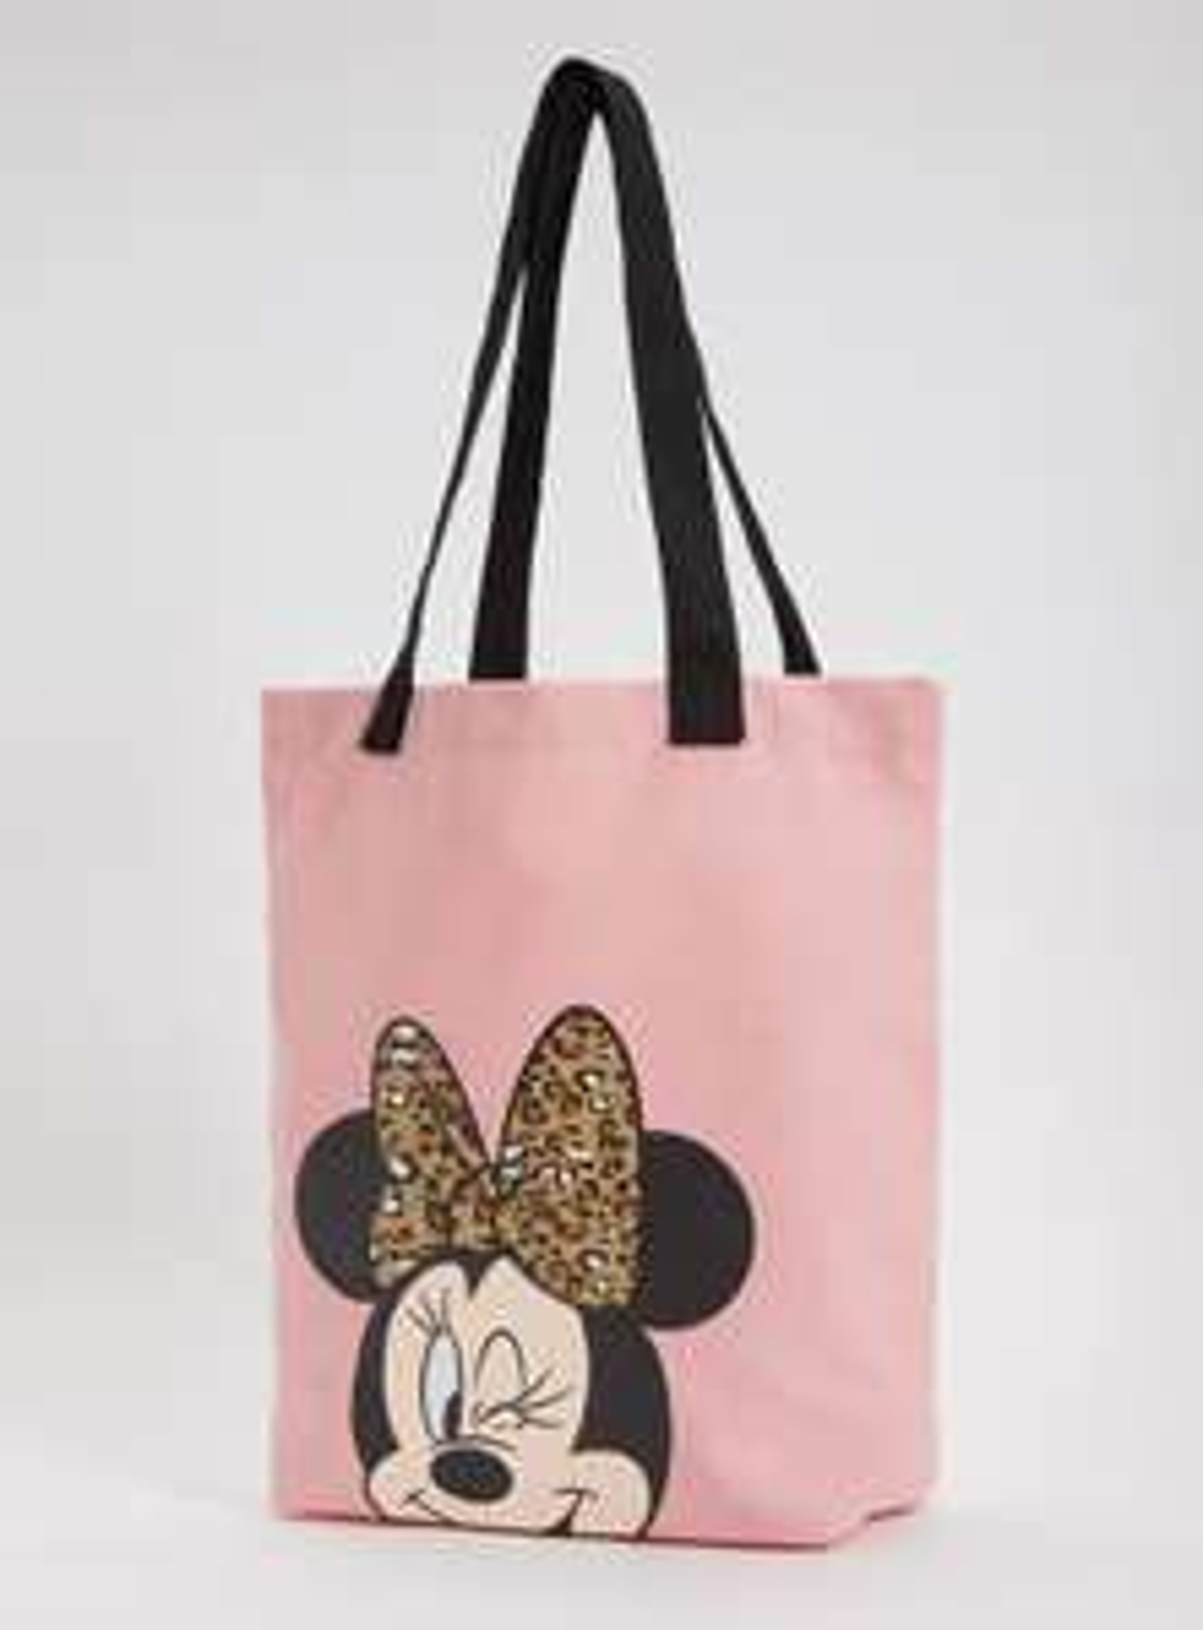 Disney canvas Tote Bag - various £5.00 at Argos - free click & collect